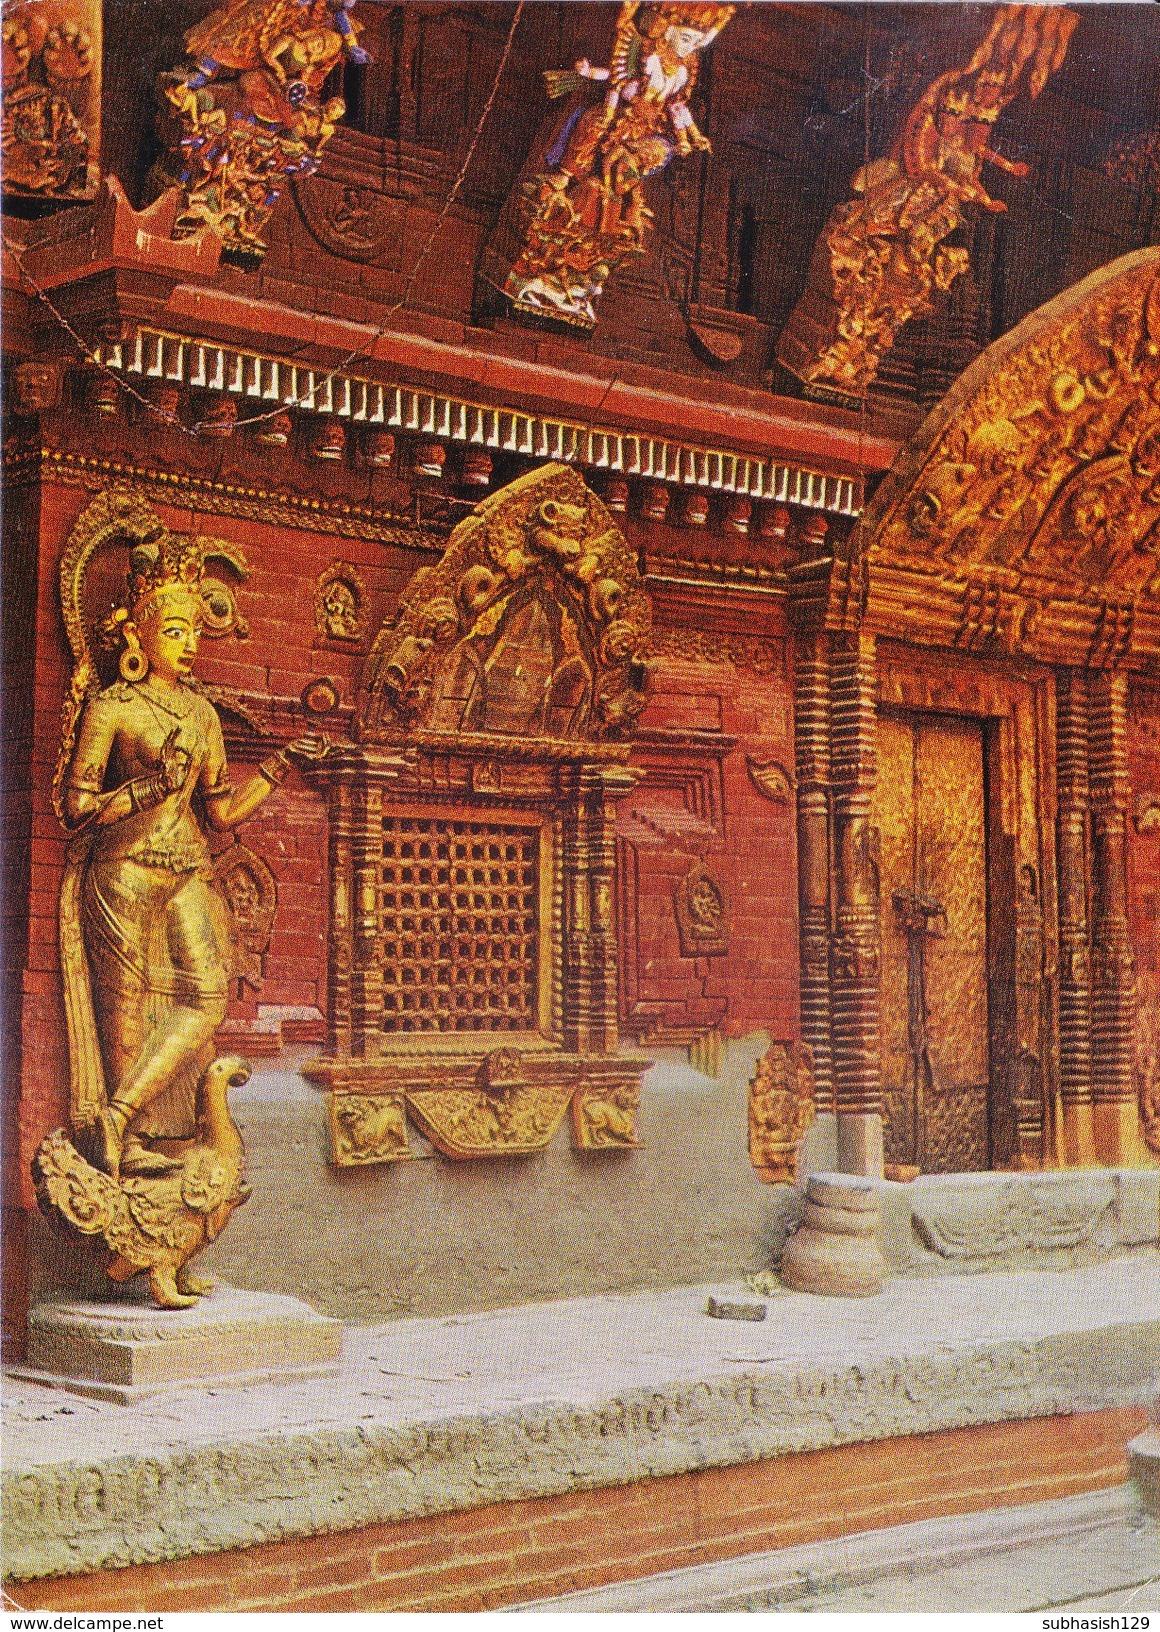 NEPAL - COLOUR PICTURE POST CARD - COTTAGE INDUSTRIES & HANDICRAFTS EMPORIUM - TOURISM - KUMARI CHOWK - Nepal